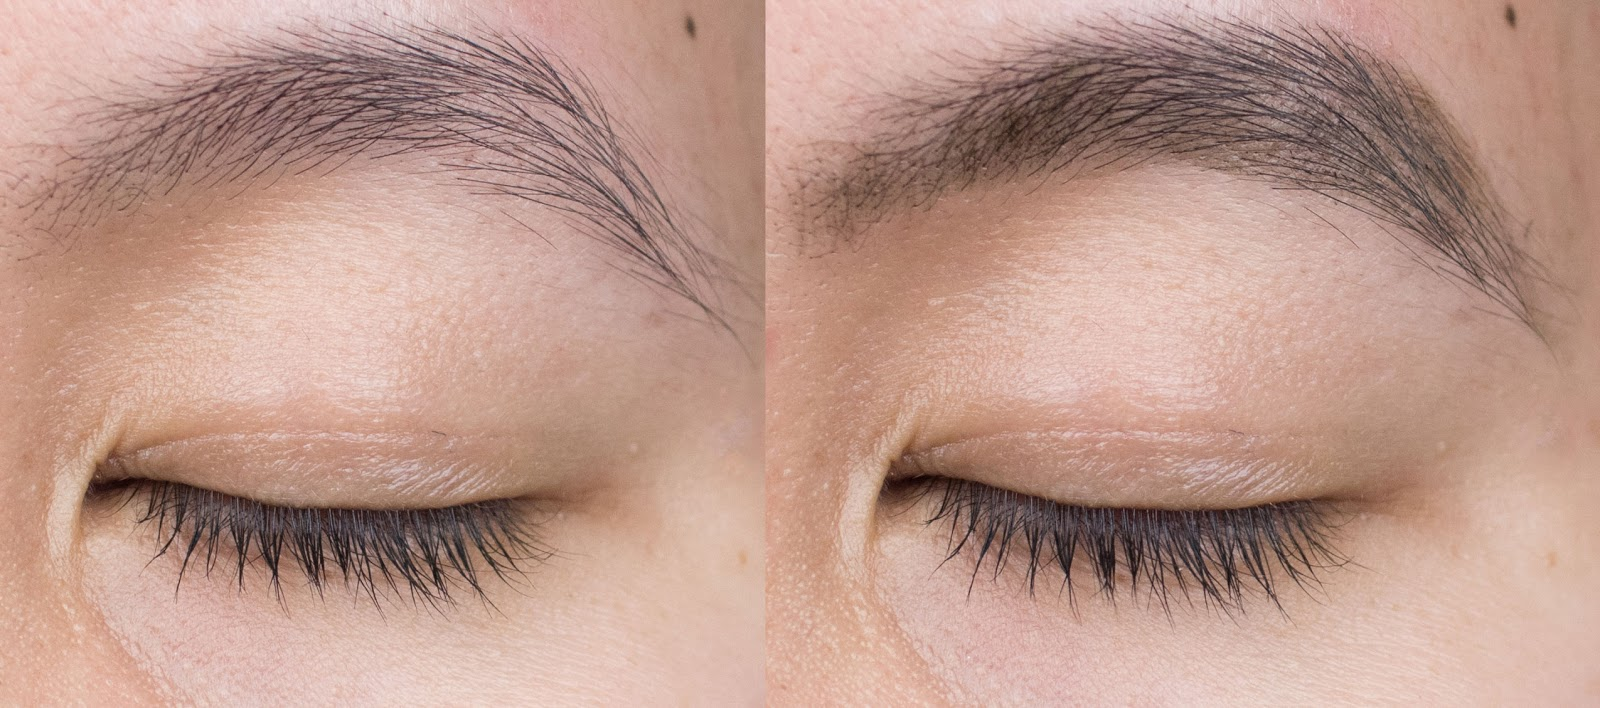 Maybelline TattooStudio Brow Tint Pen Makeup Review: Is It